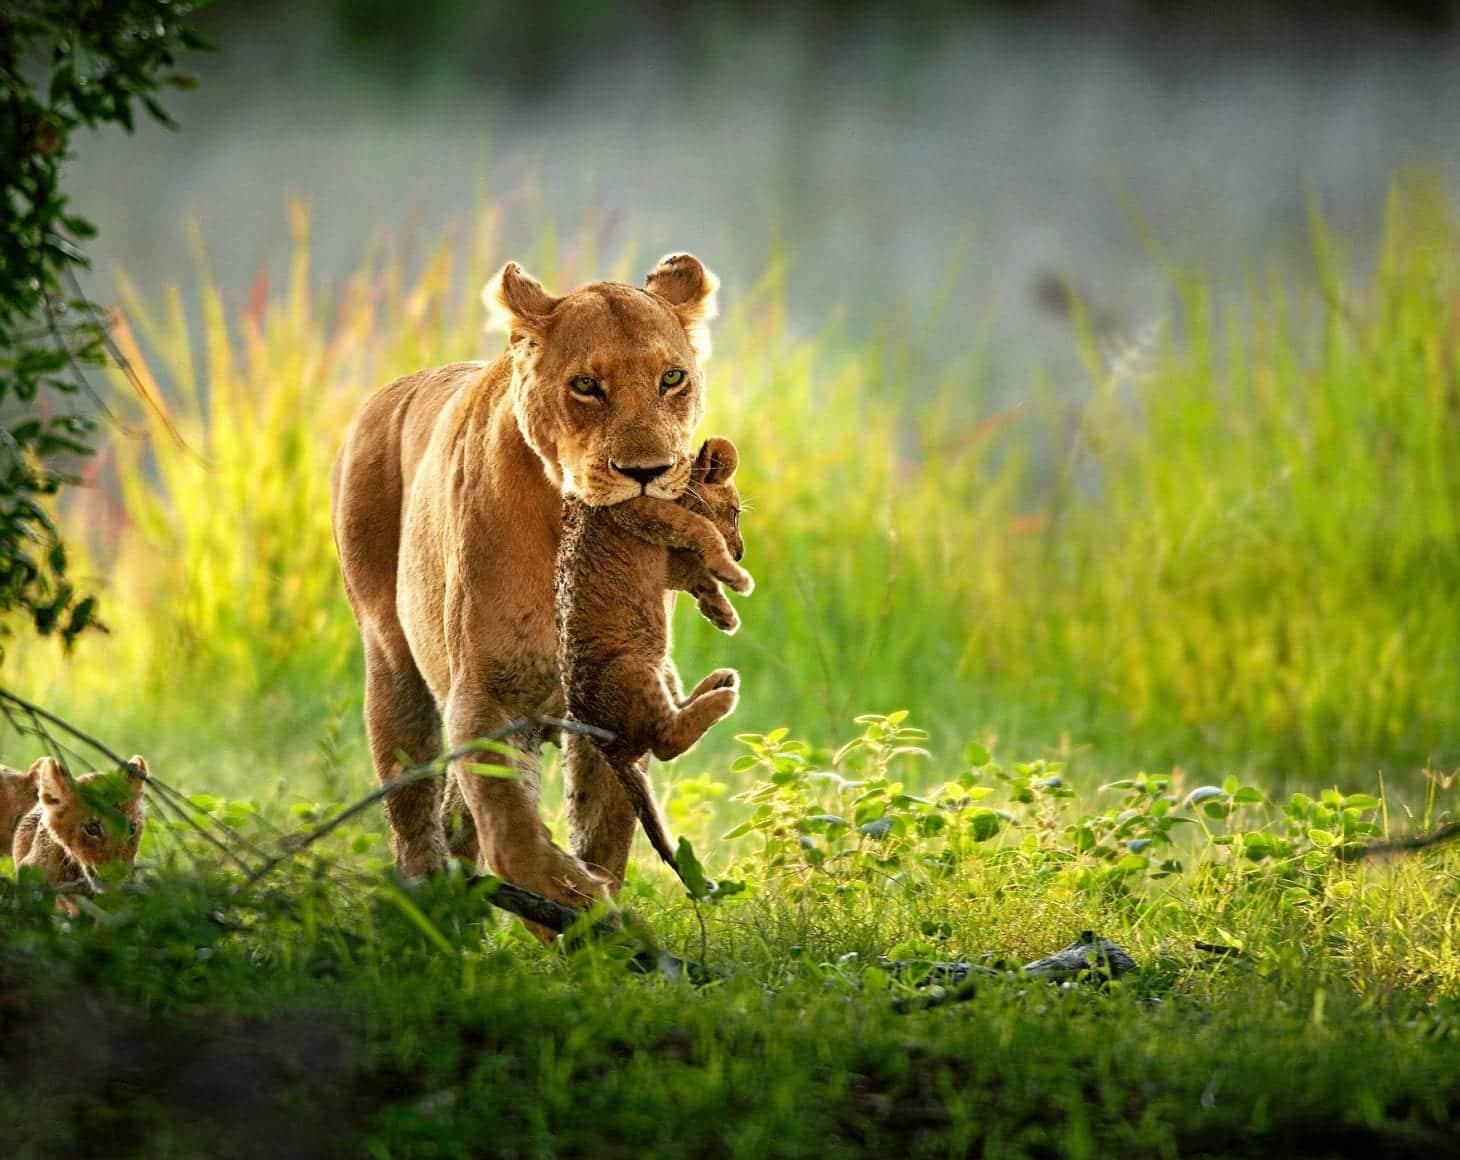 An African Safari's Most Wonderful Gifts